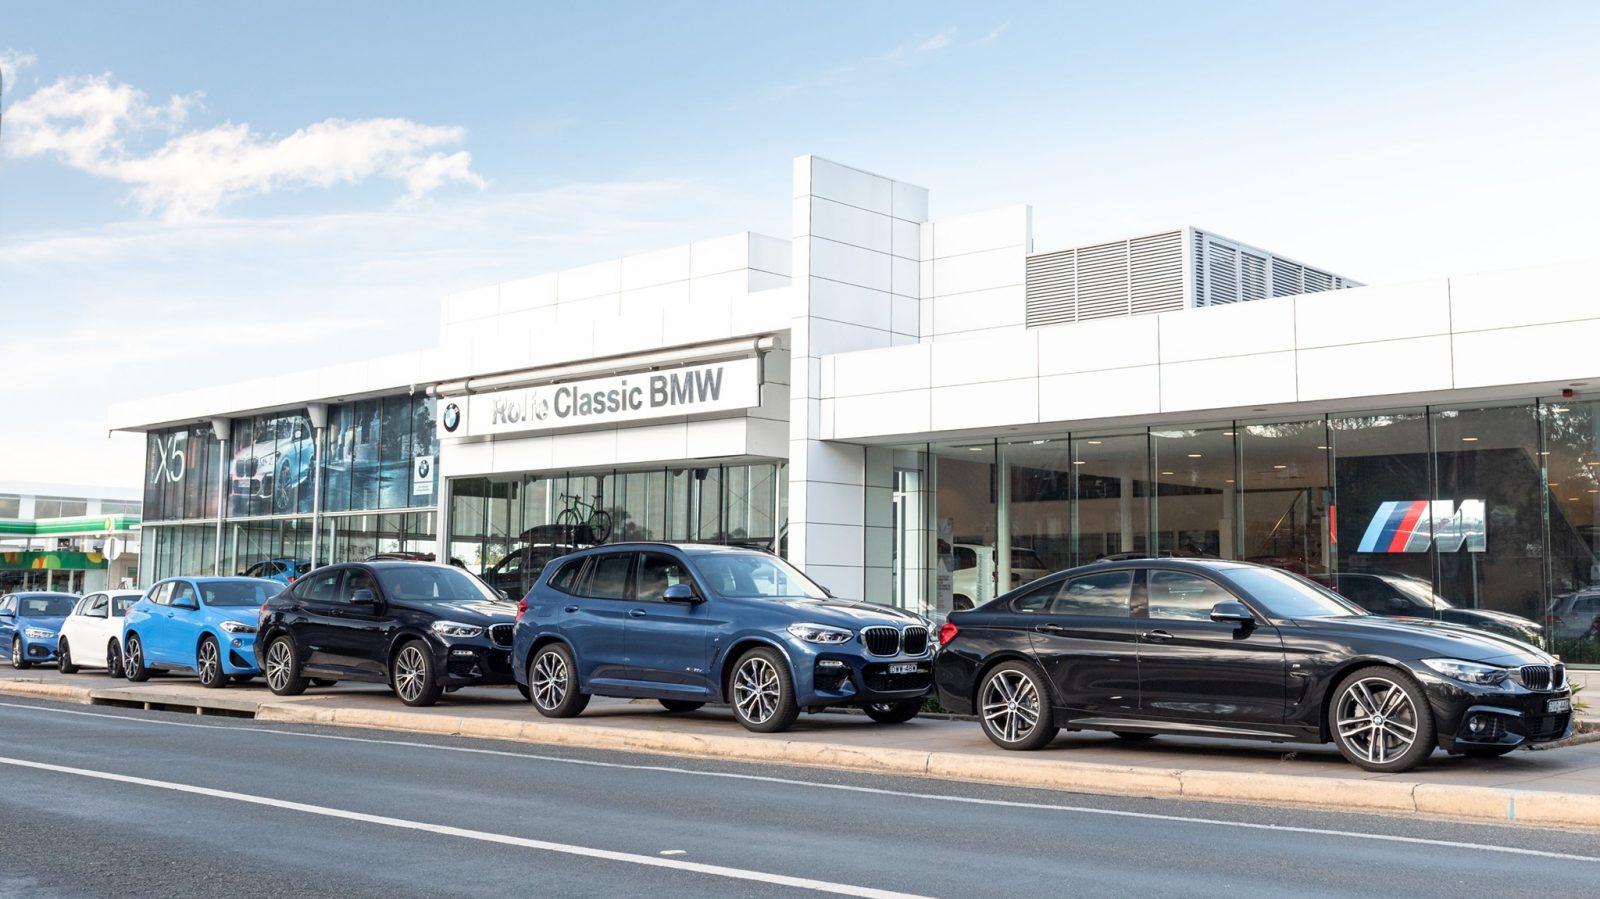 Image: Rolfe Classic BMW